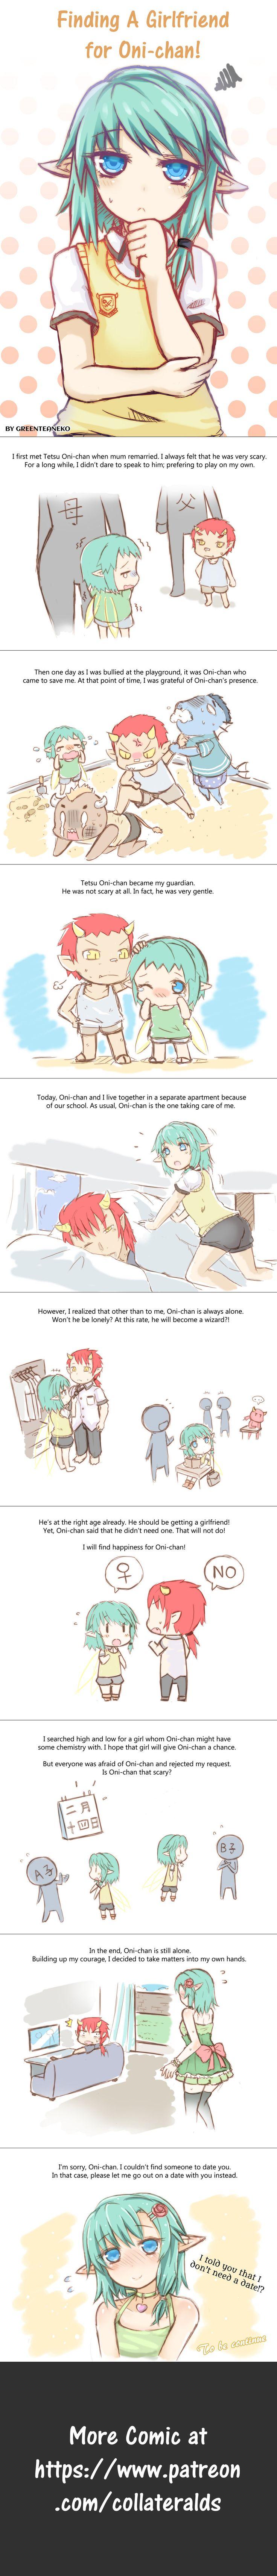 Webcomic: Finding A Girlfriend For Oni-chan! by GreenTeaNeko